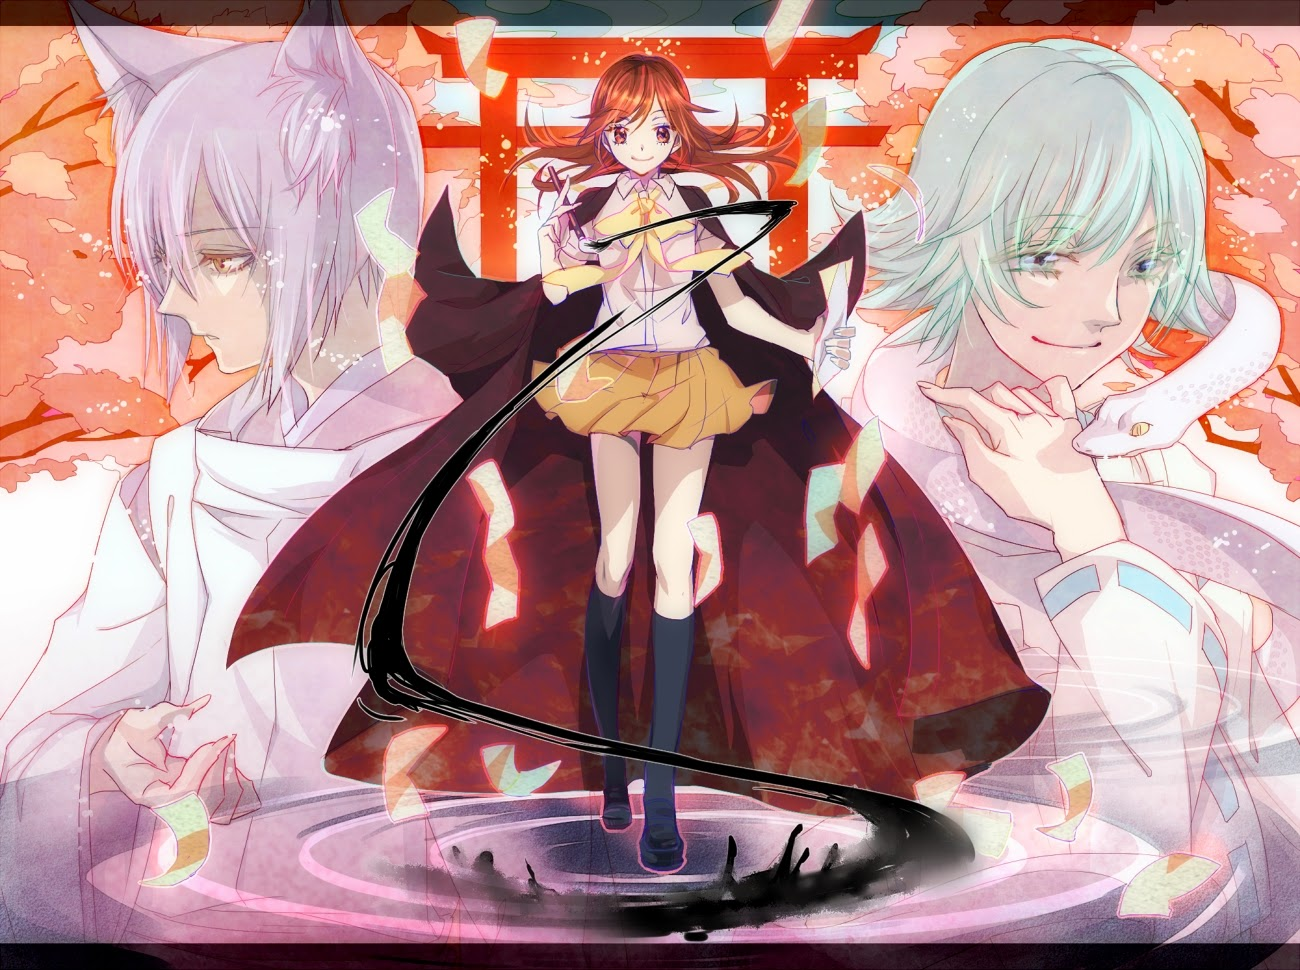 Картинки из аниме очень приятно бог